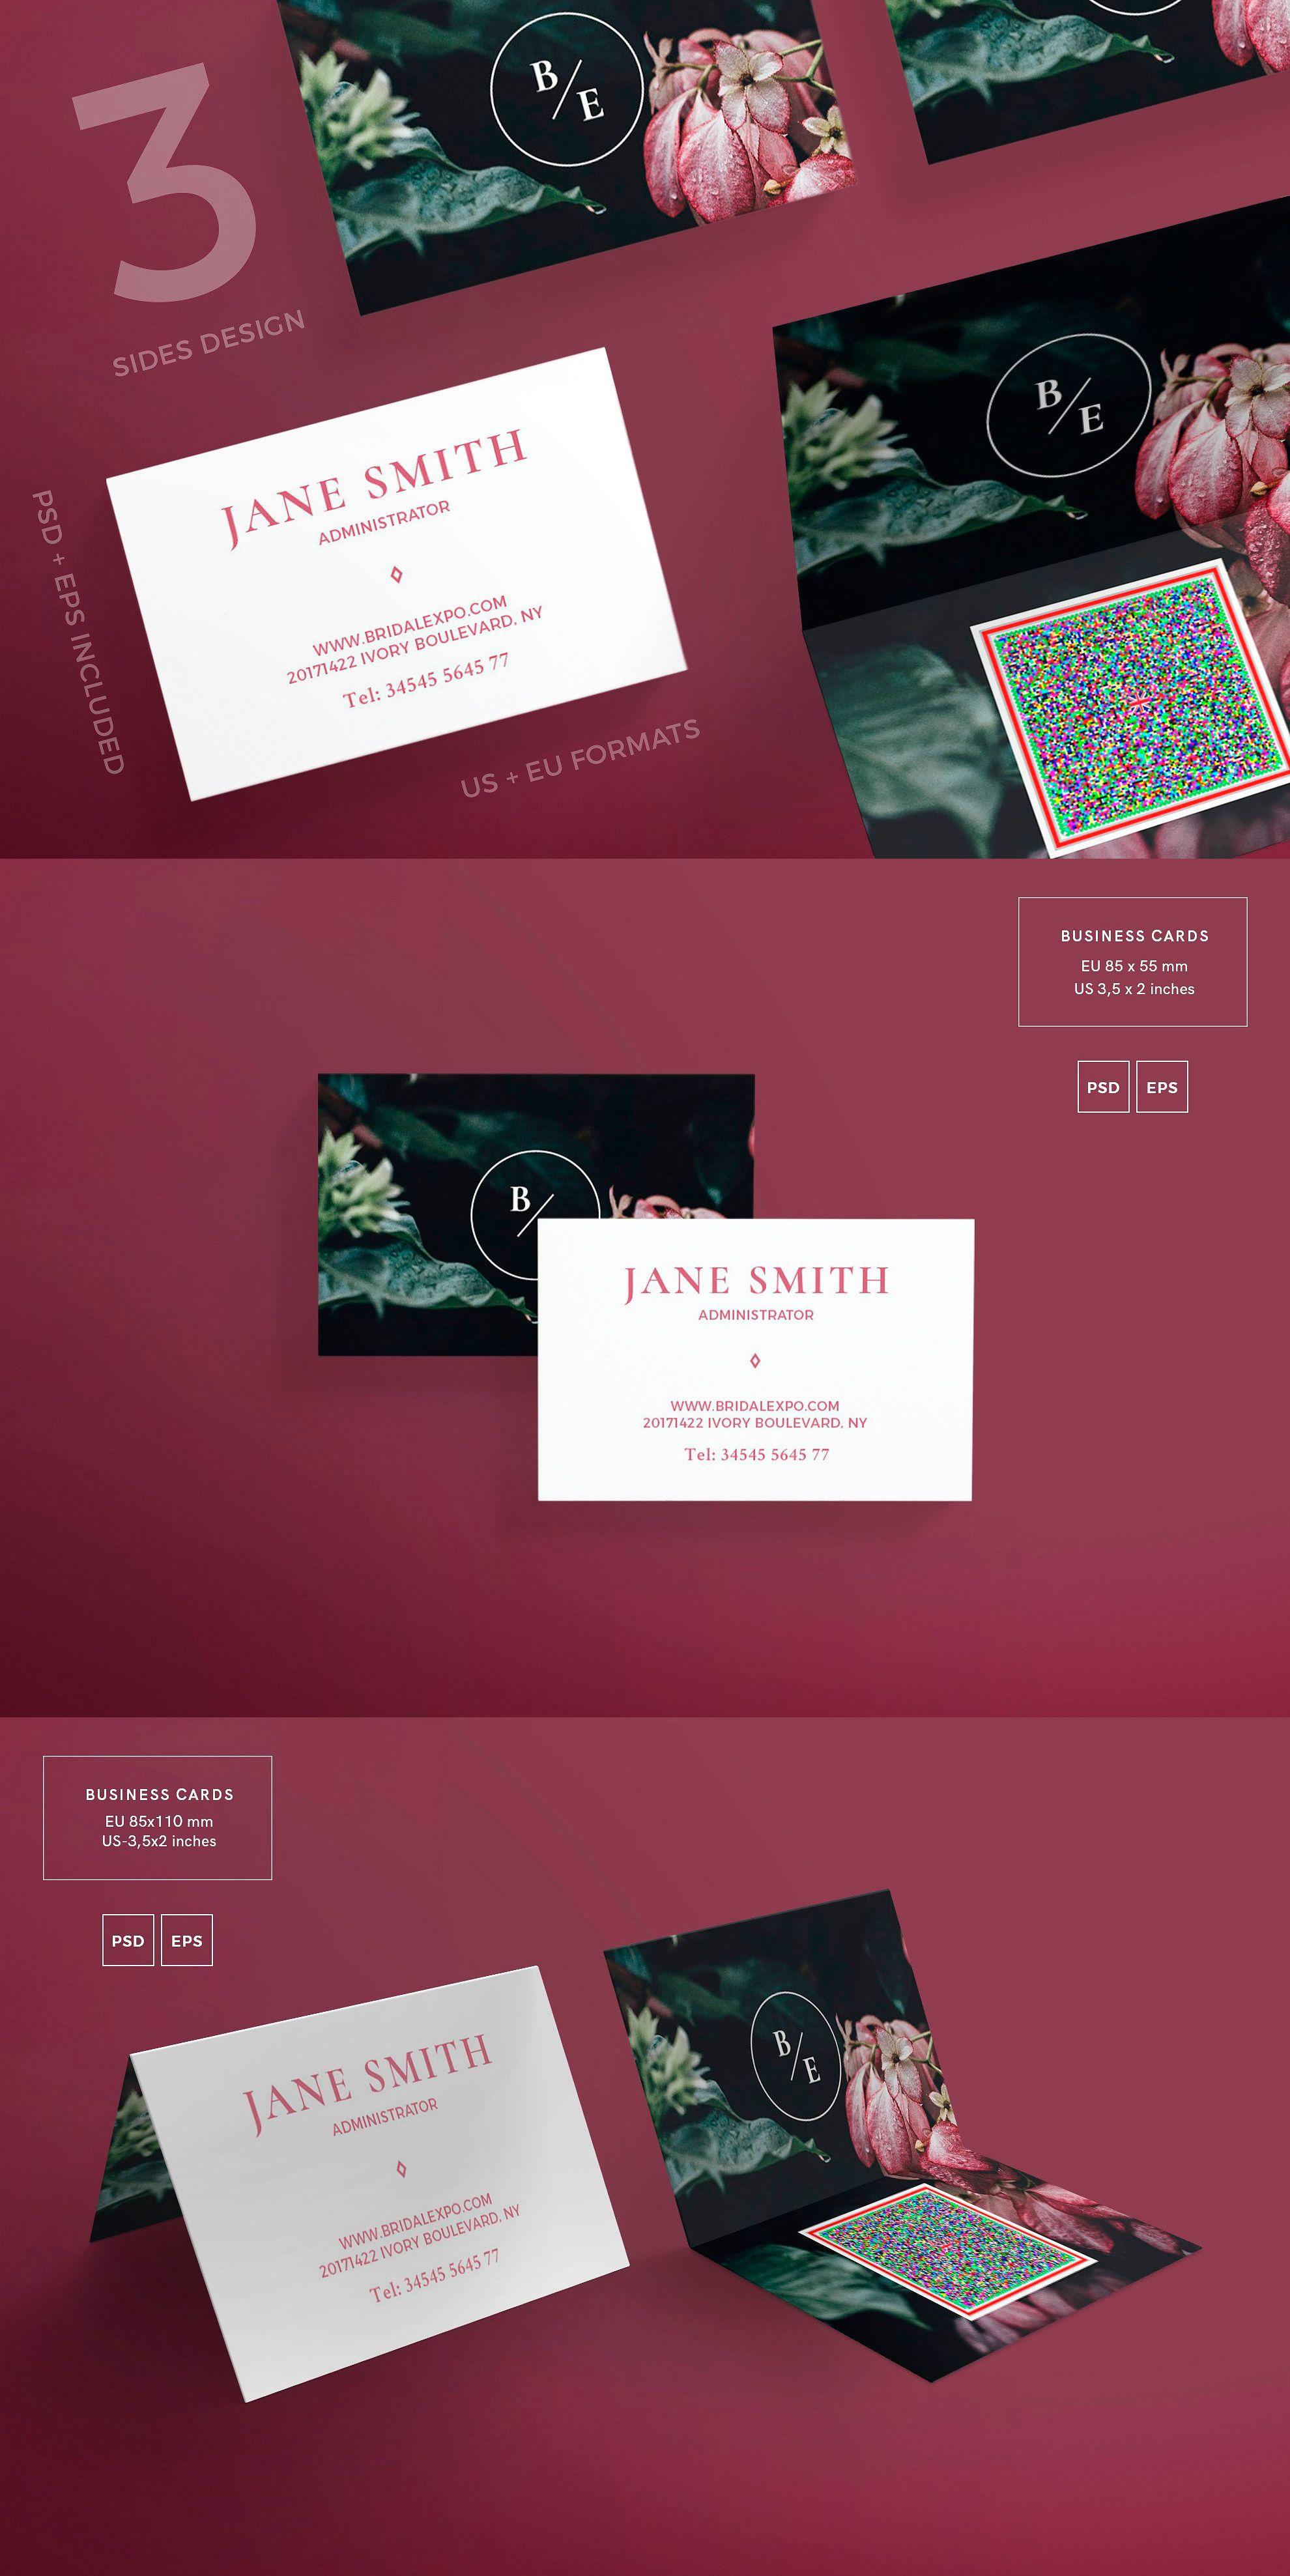 Business cards template bridal expo pdf jpg business card business cards template bridal expo pdf jpg wajeb Choice Image